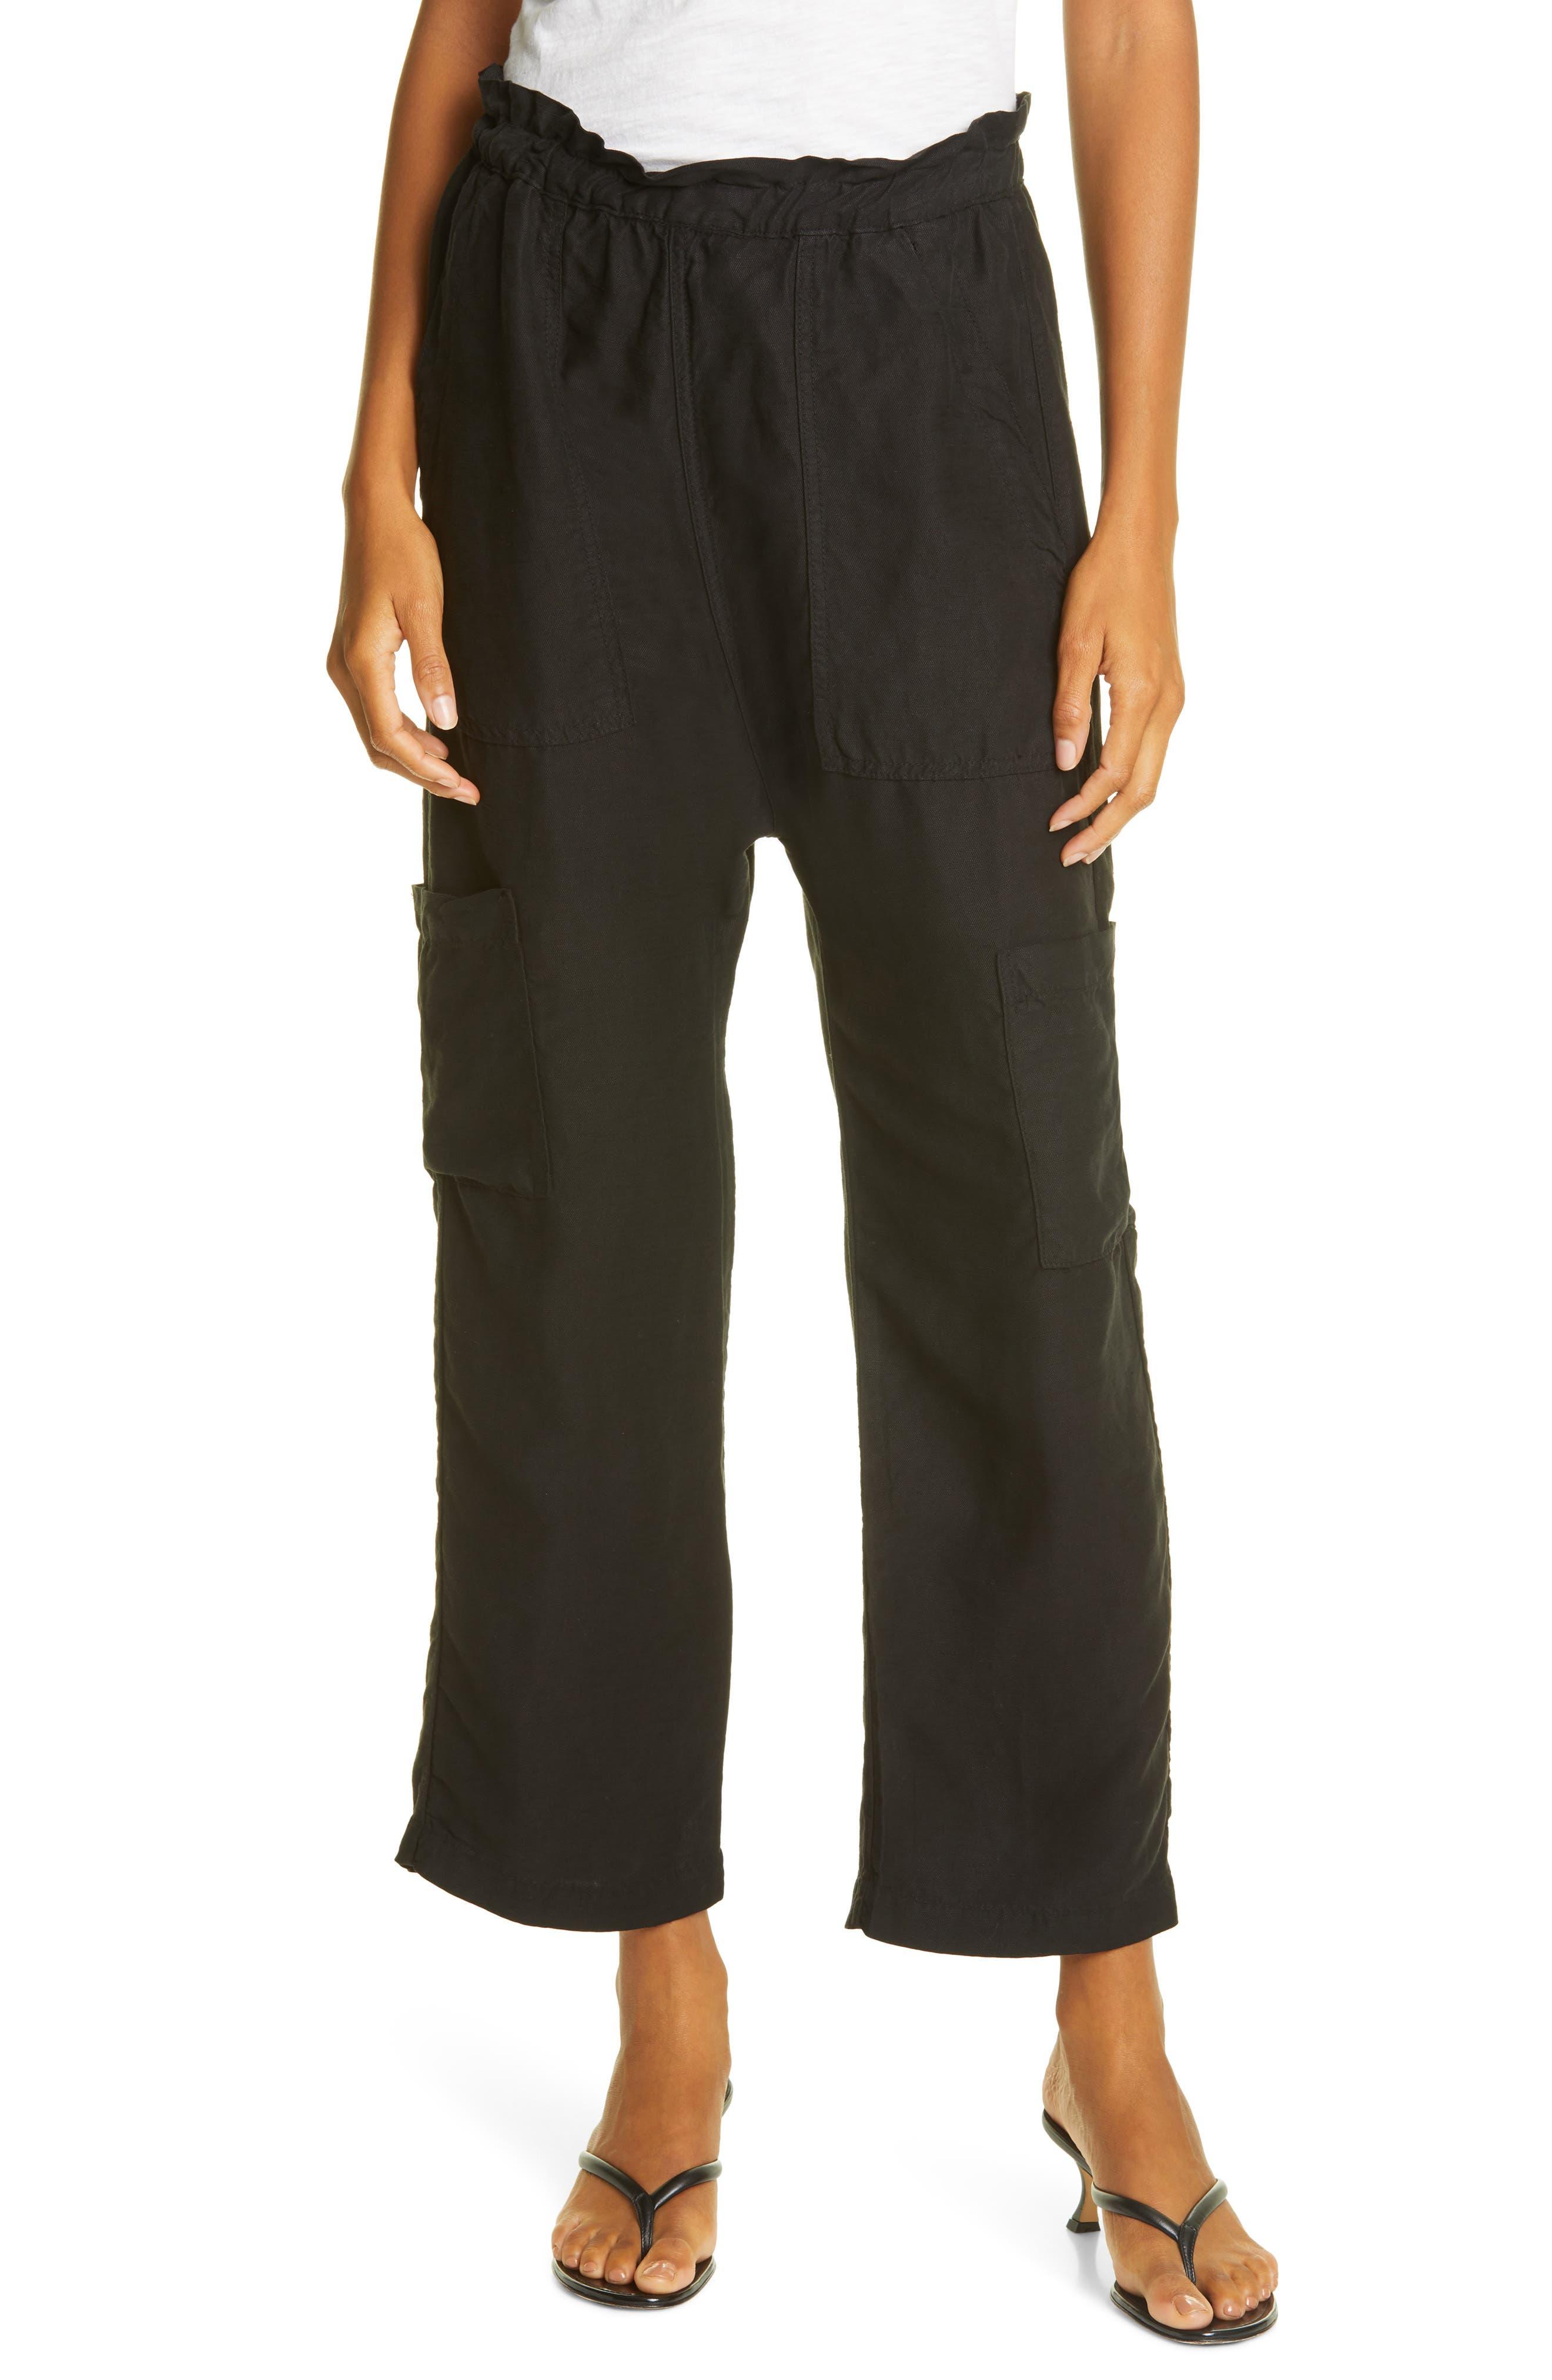 NSF Clothing Women's Nsf Clothing Shailey Paperbag Waist Pants, Size Petite - Black